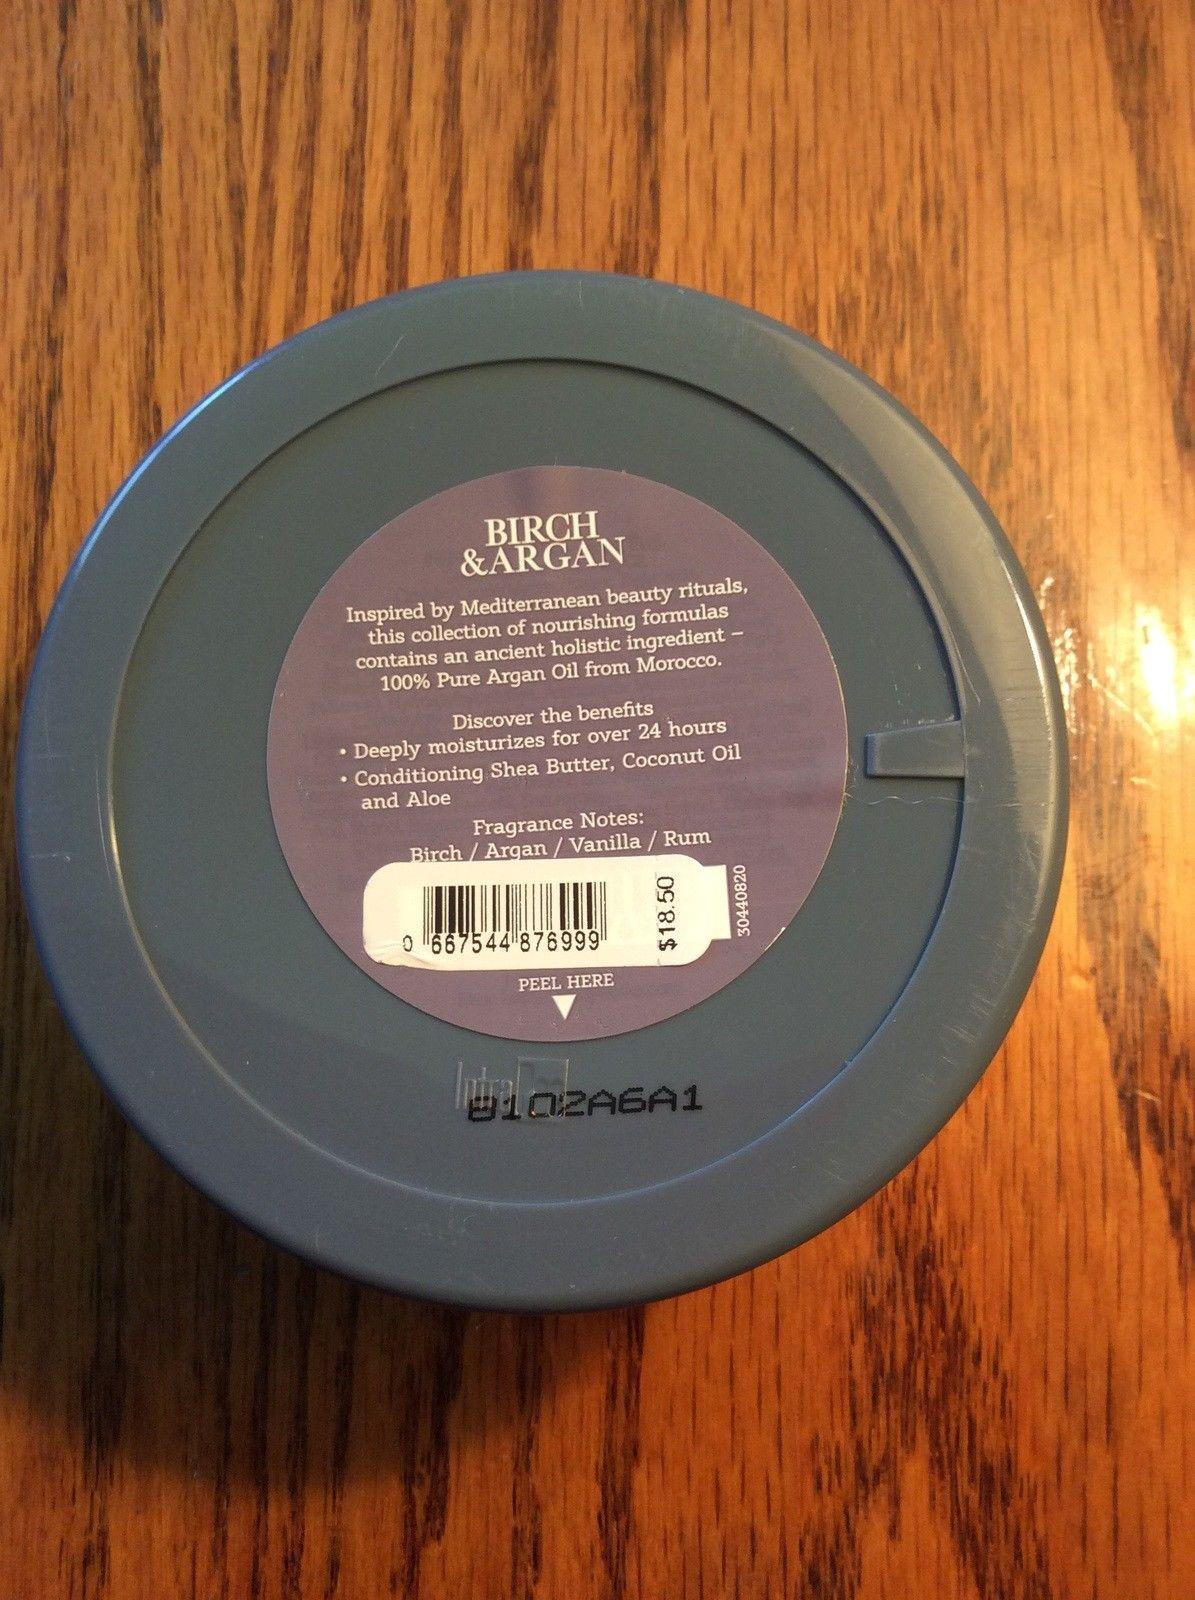 Birch and Argan Body butter 8 ounce Bath & Body Works Pure Argan Oil Aloe New